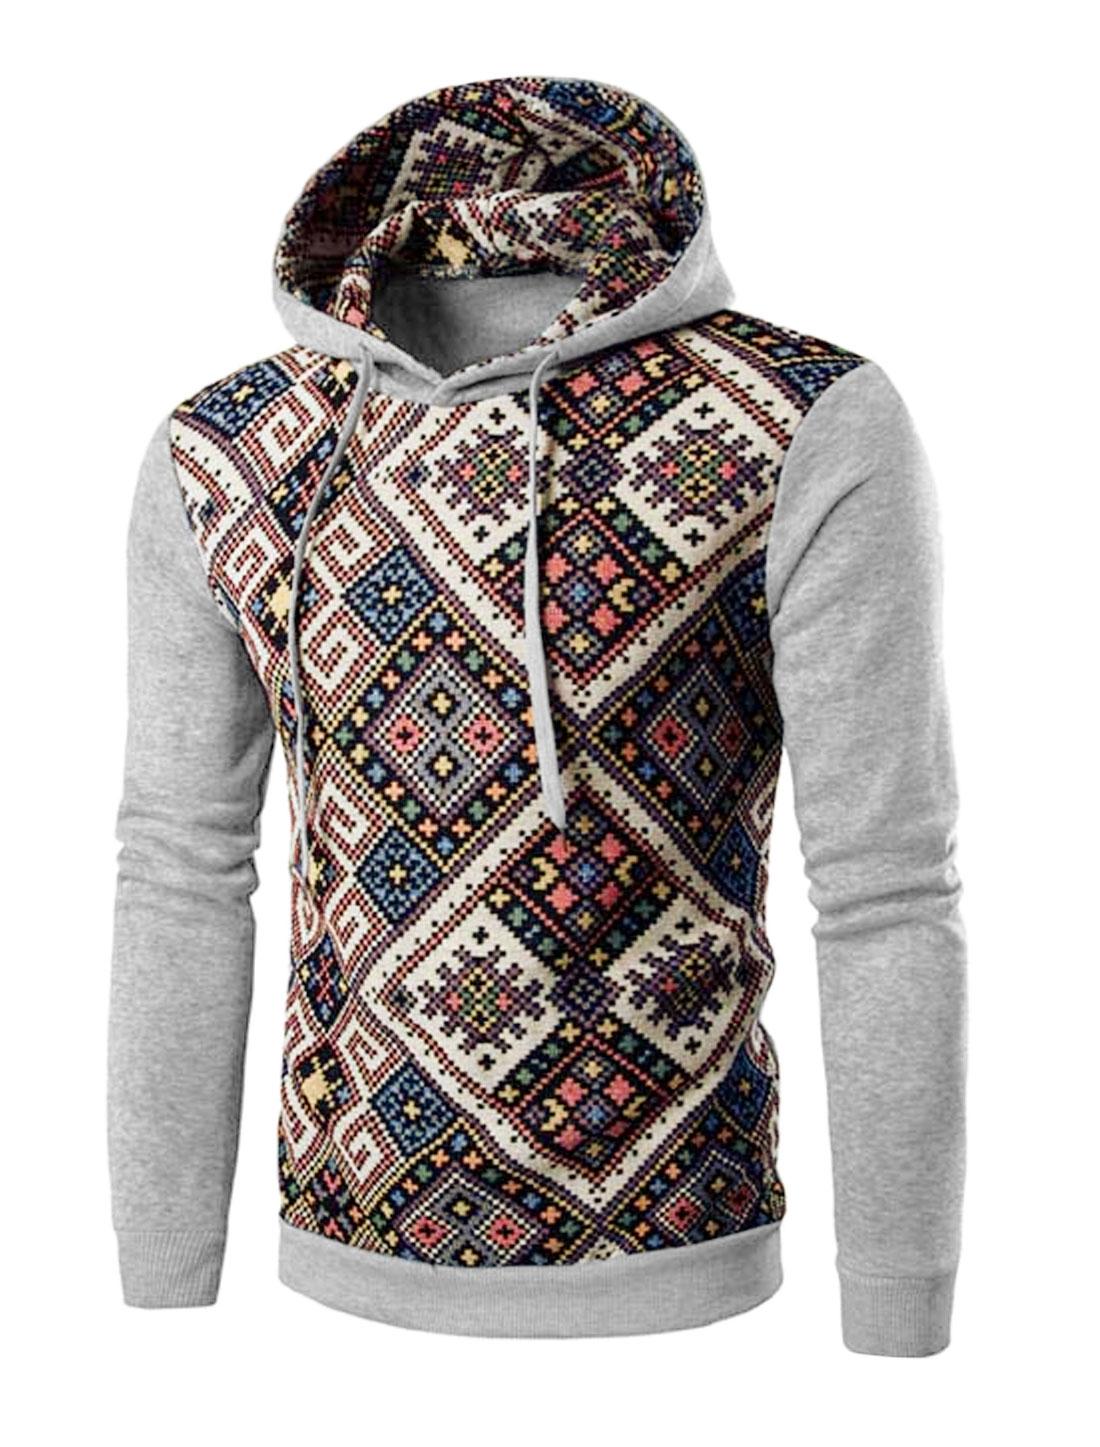 Men Argyle Print Long Sleeve Drawstring Hooded Sweatshirt Light Gray M